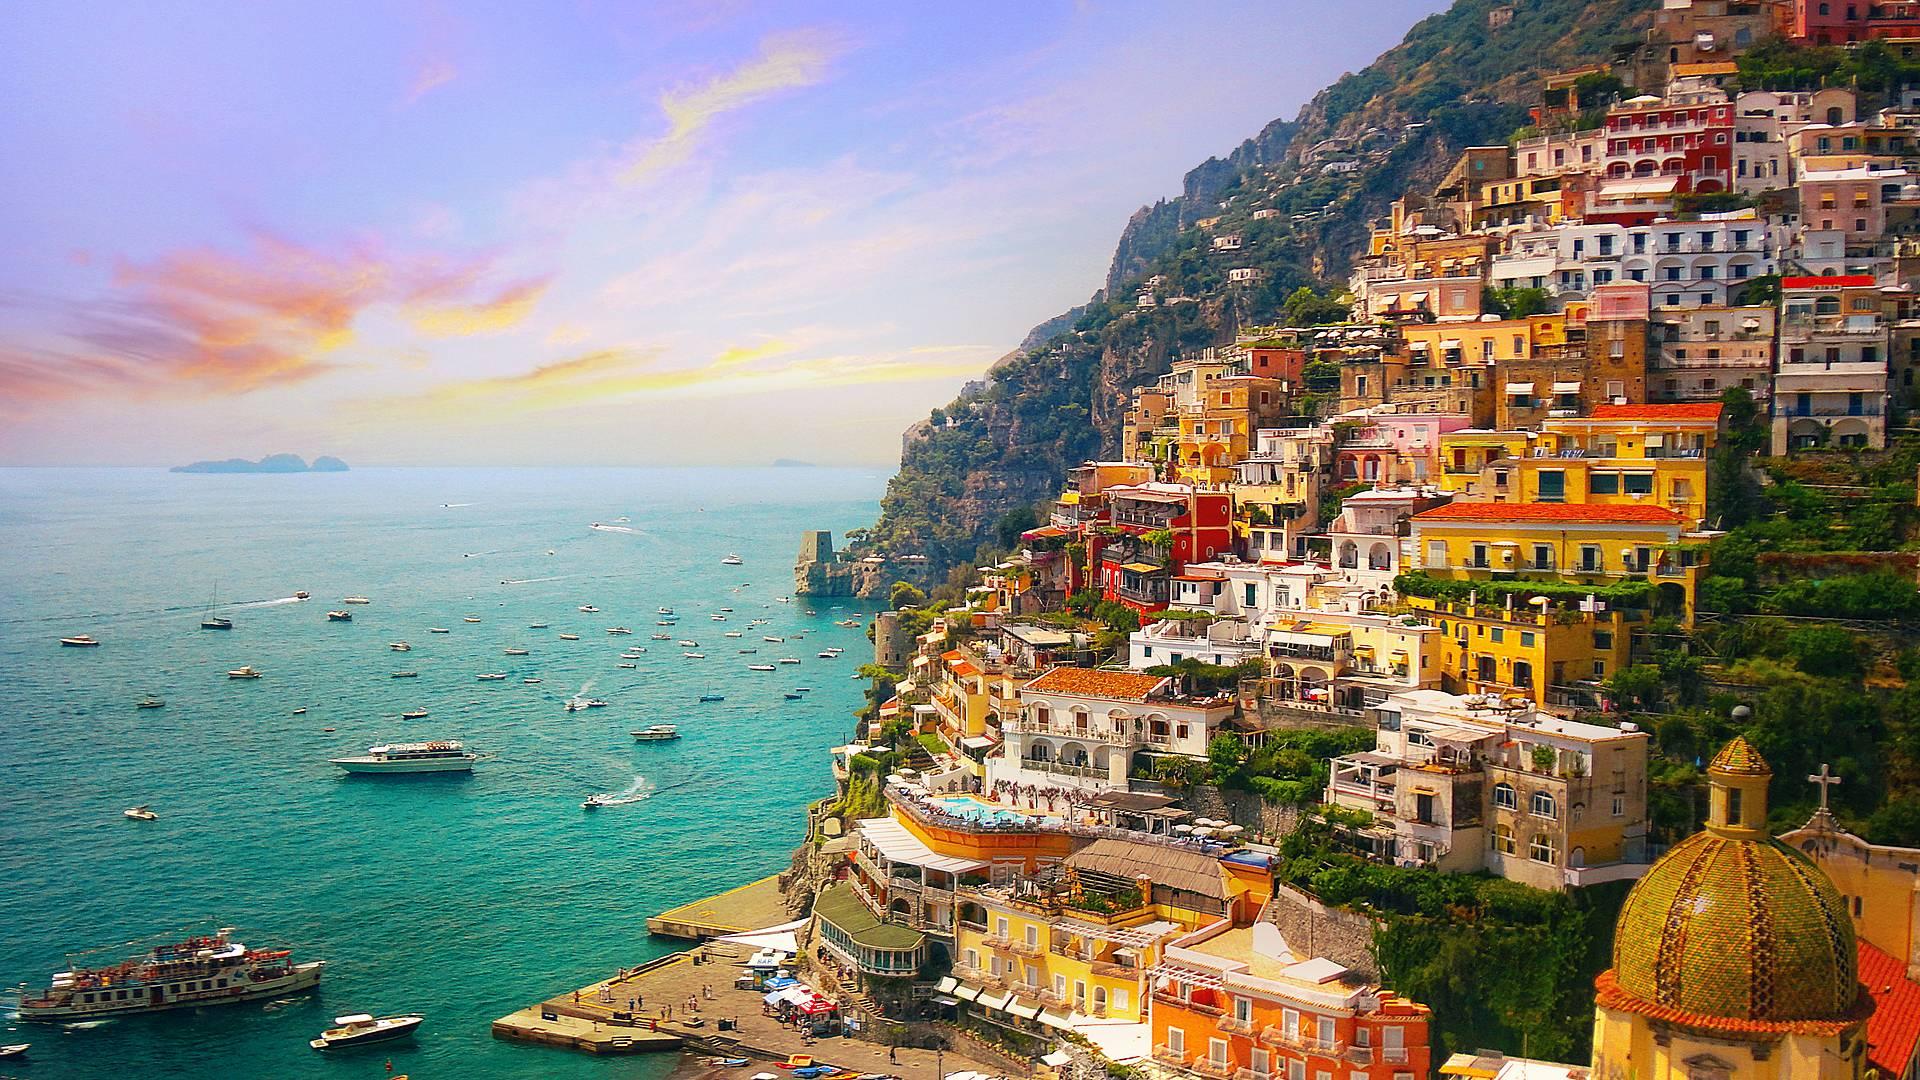 Descubre la belleza única de la Costa Amalfitana